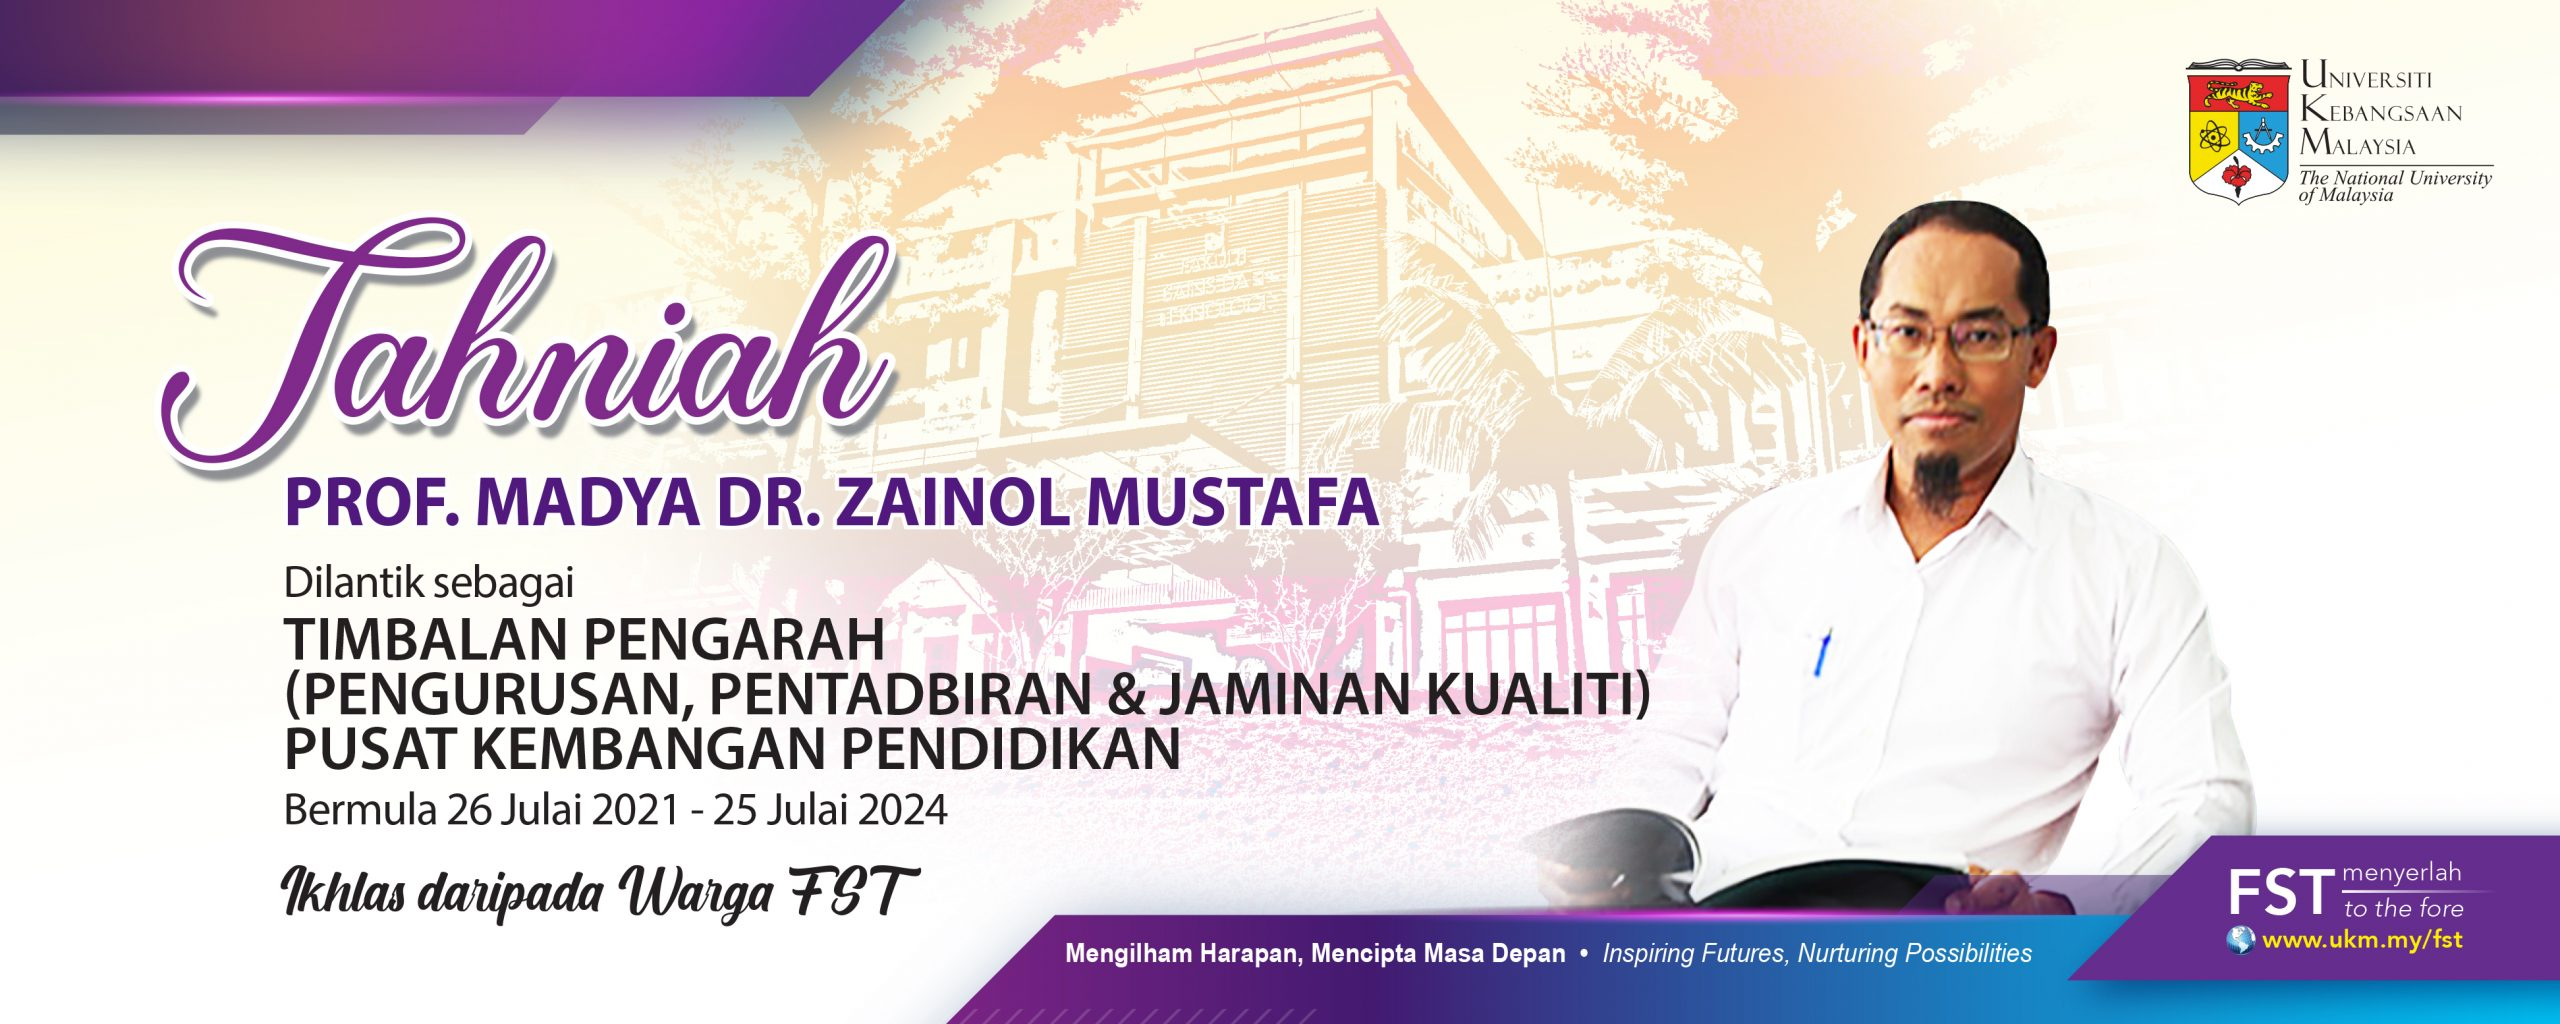 Tahniah Prof Dr Zainol